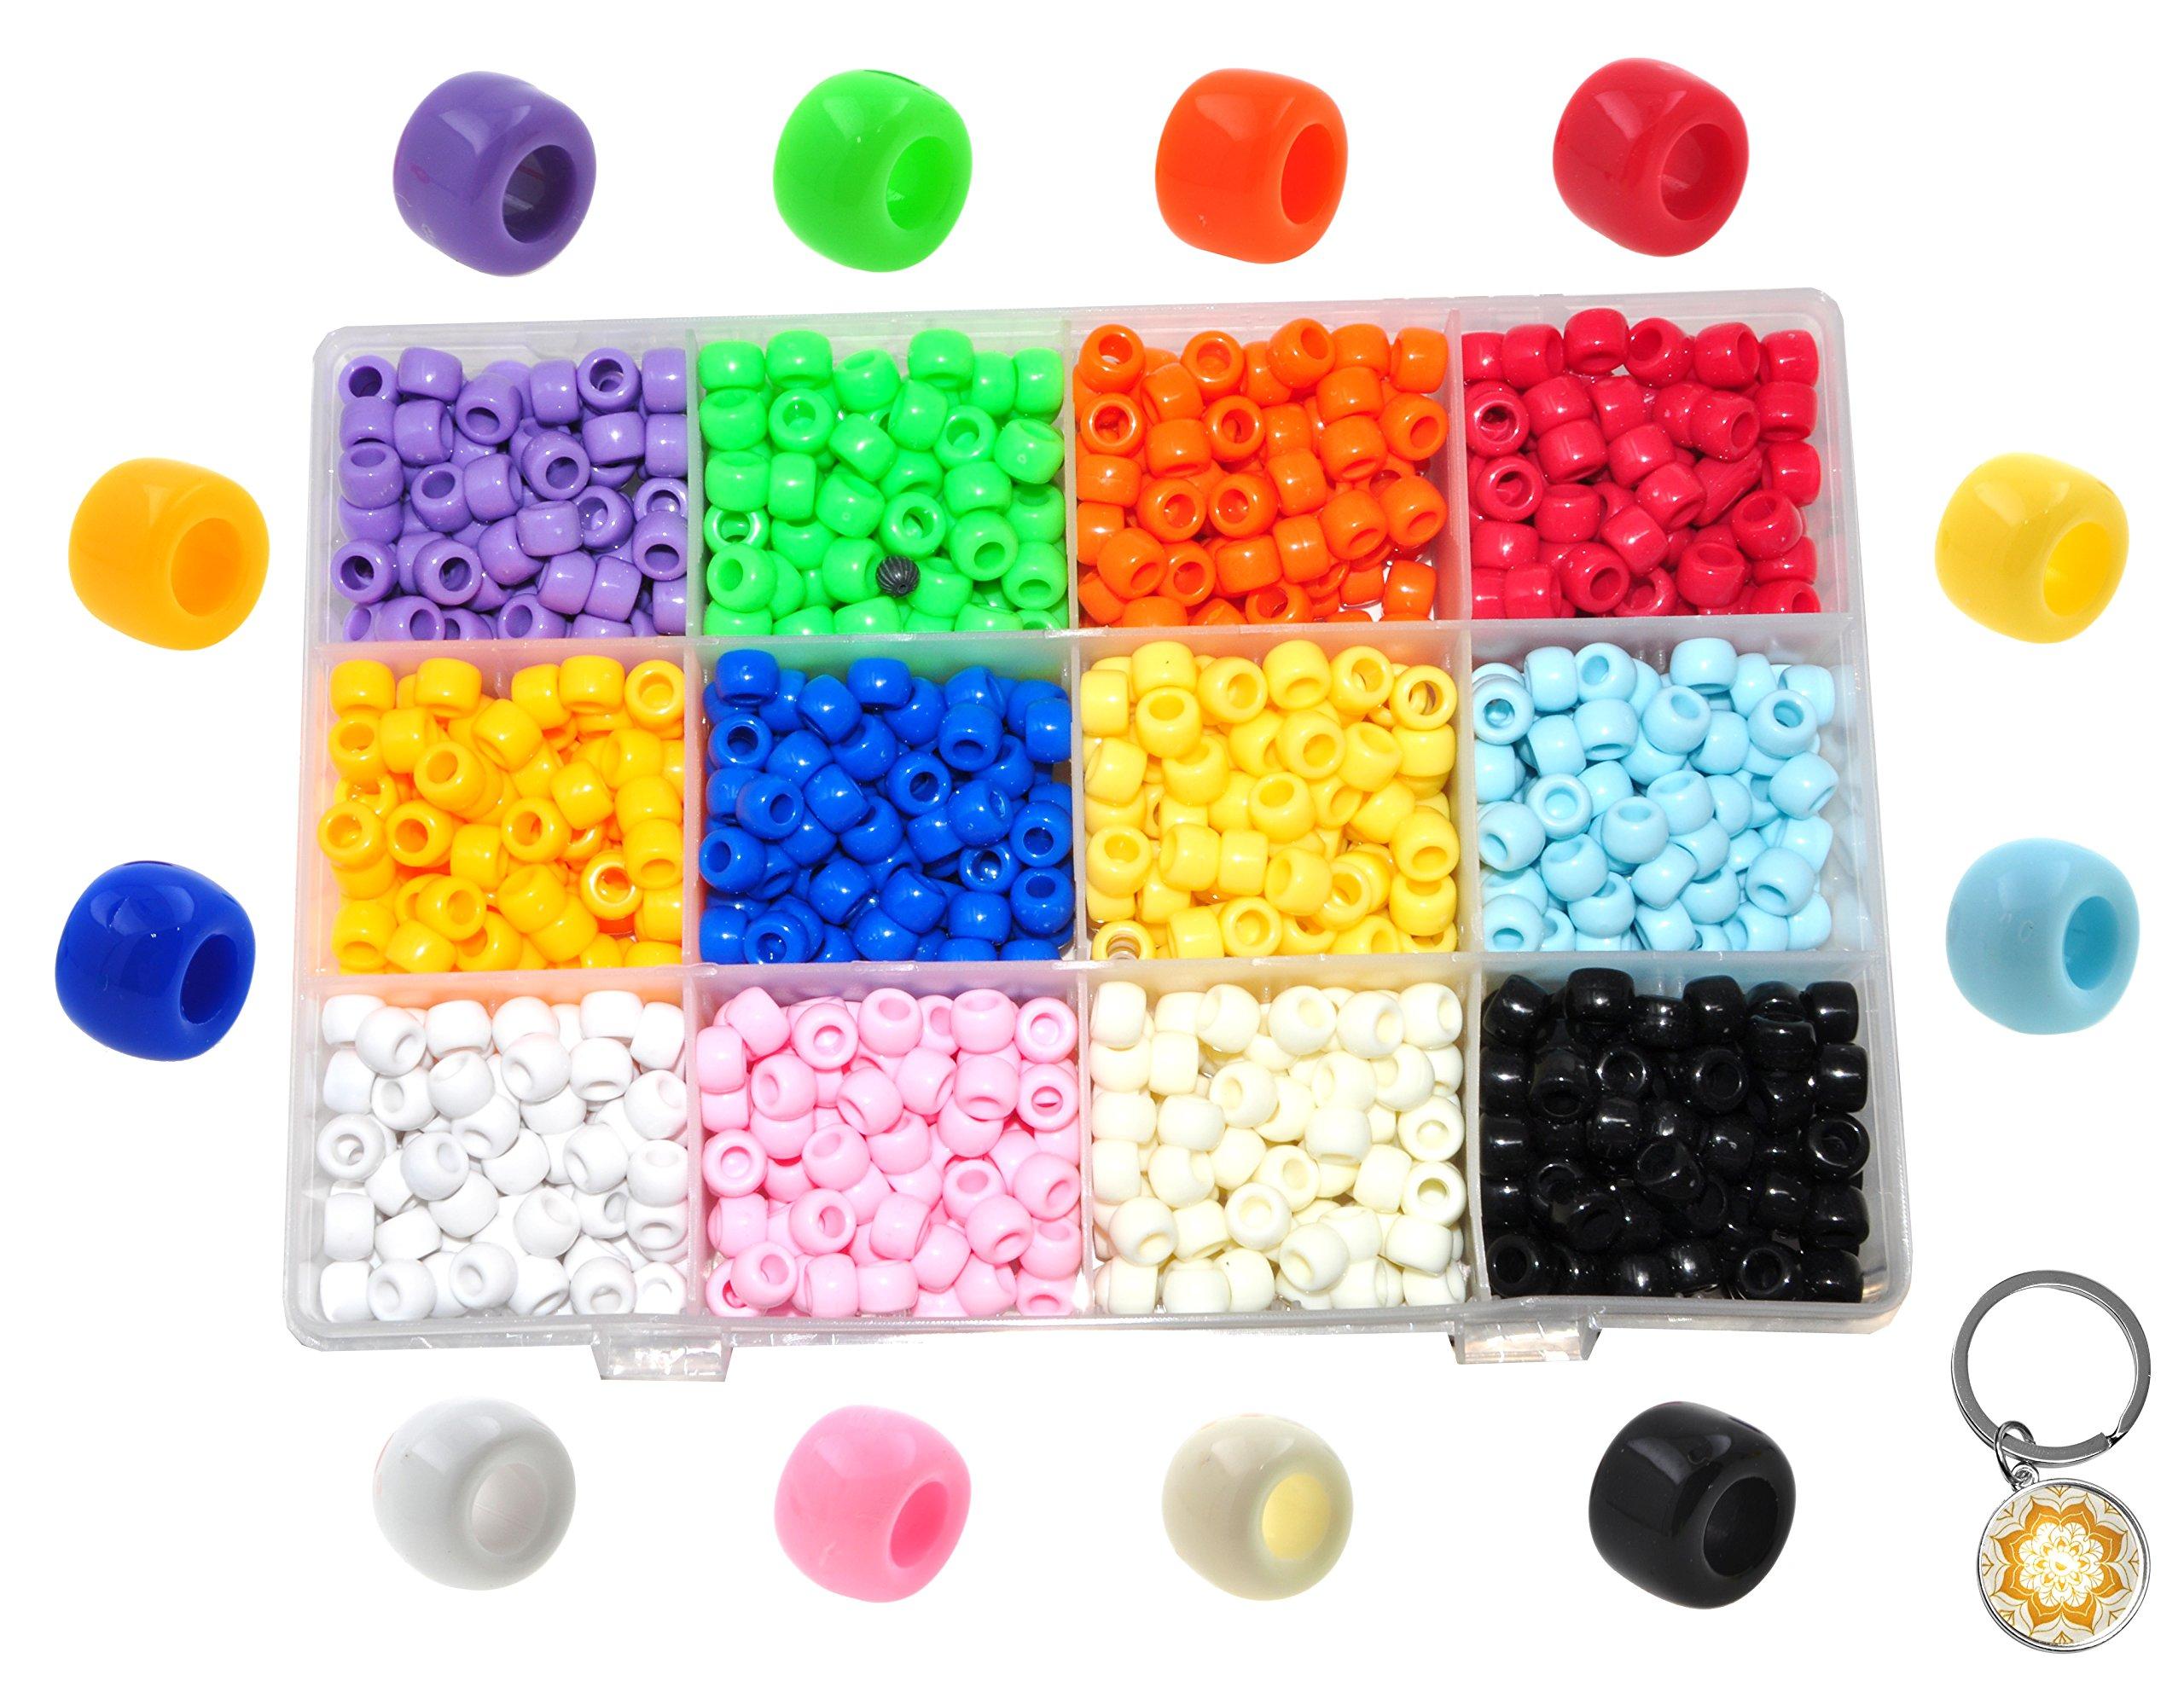 Mandala Crafts Pony Beads Kit from Plastic Acrylic with Organizer Box, Opaque Multi Colored Assorted Bulk Variety Set (9 X 9 X 6 mm, Rainbow)